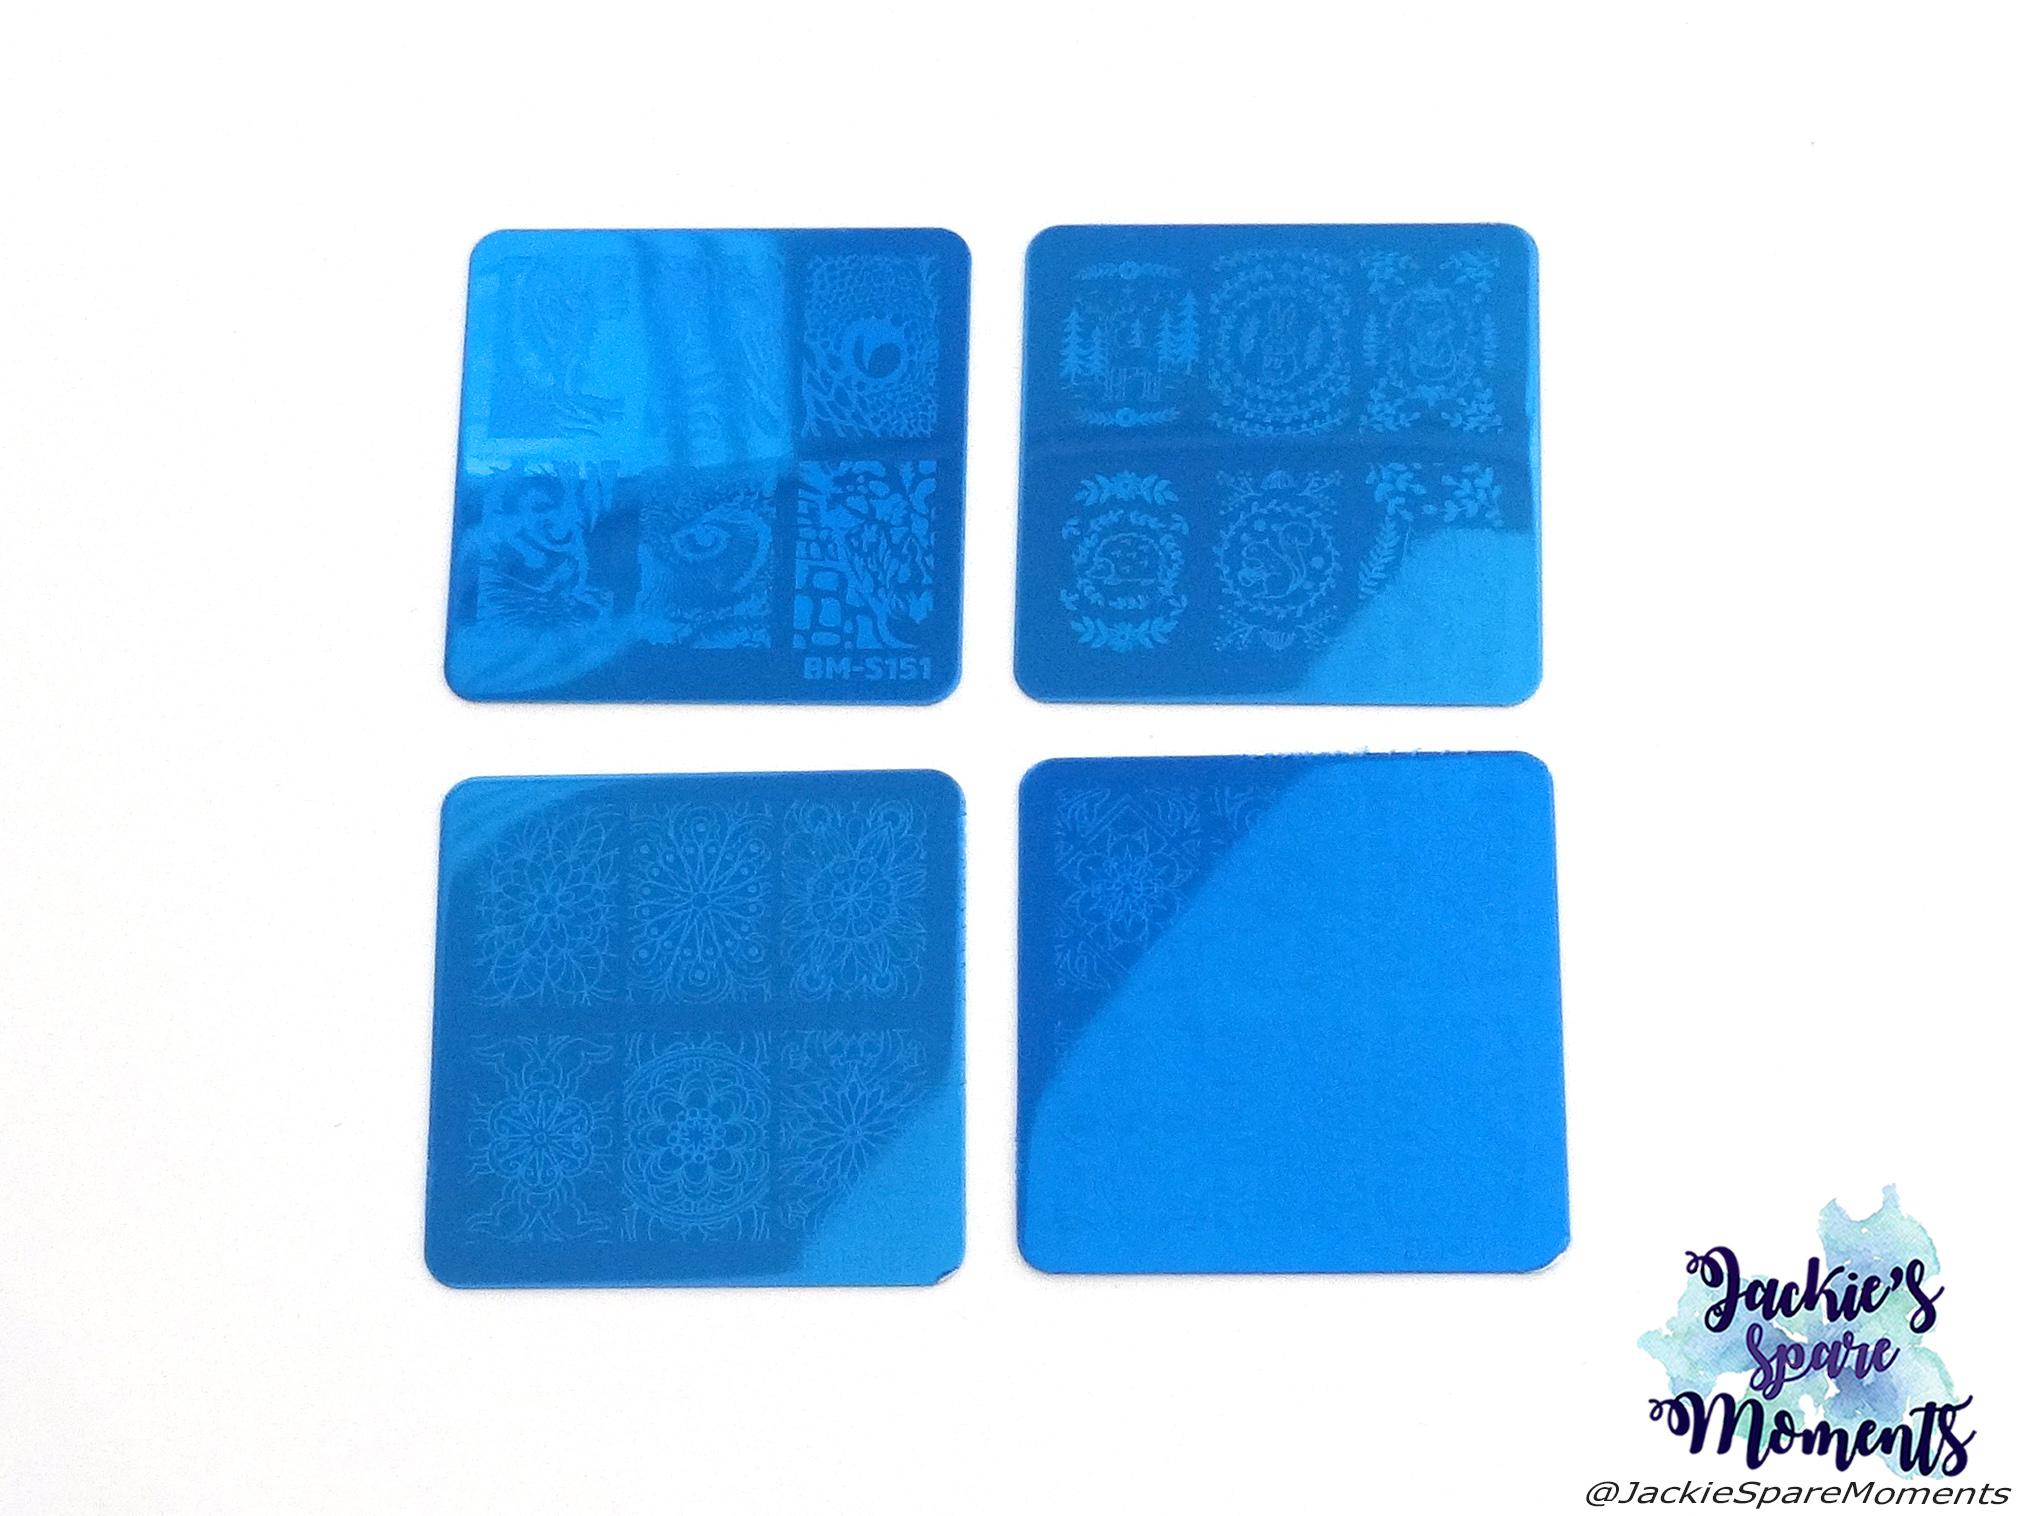 My Maniology Mystery Box, 4 small square stamping plates BM-S151, BM-S176, BM-S185, BM-S186